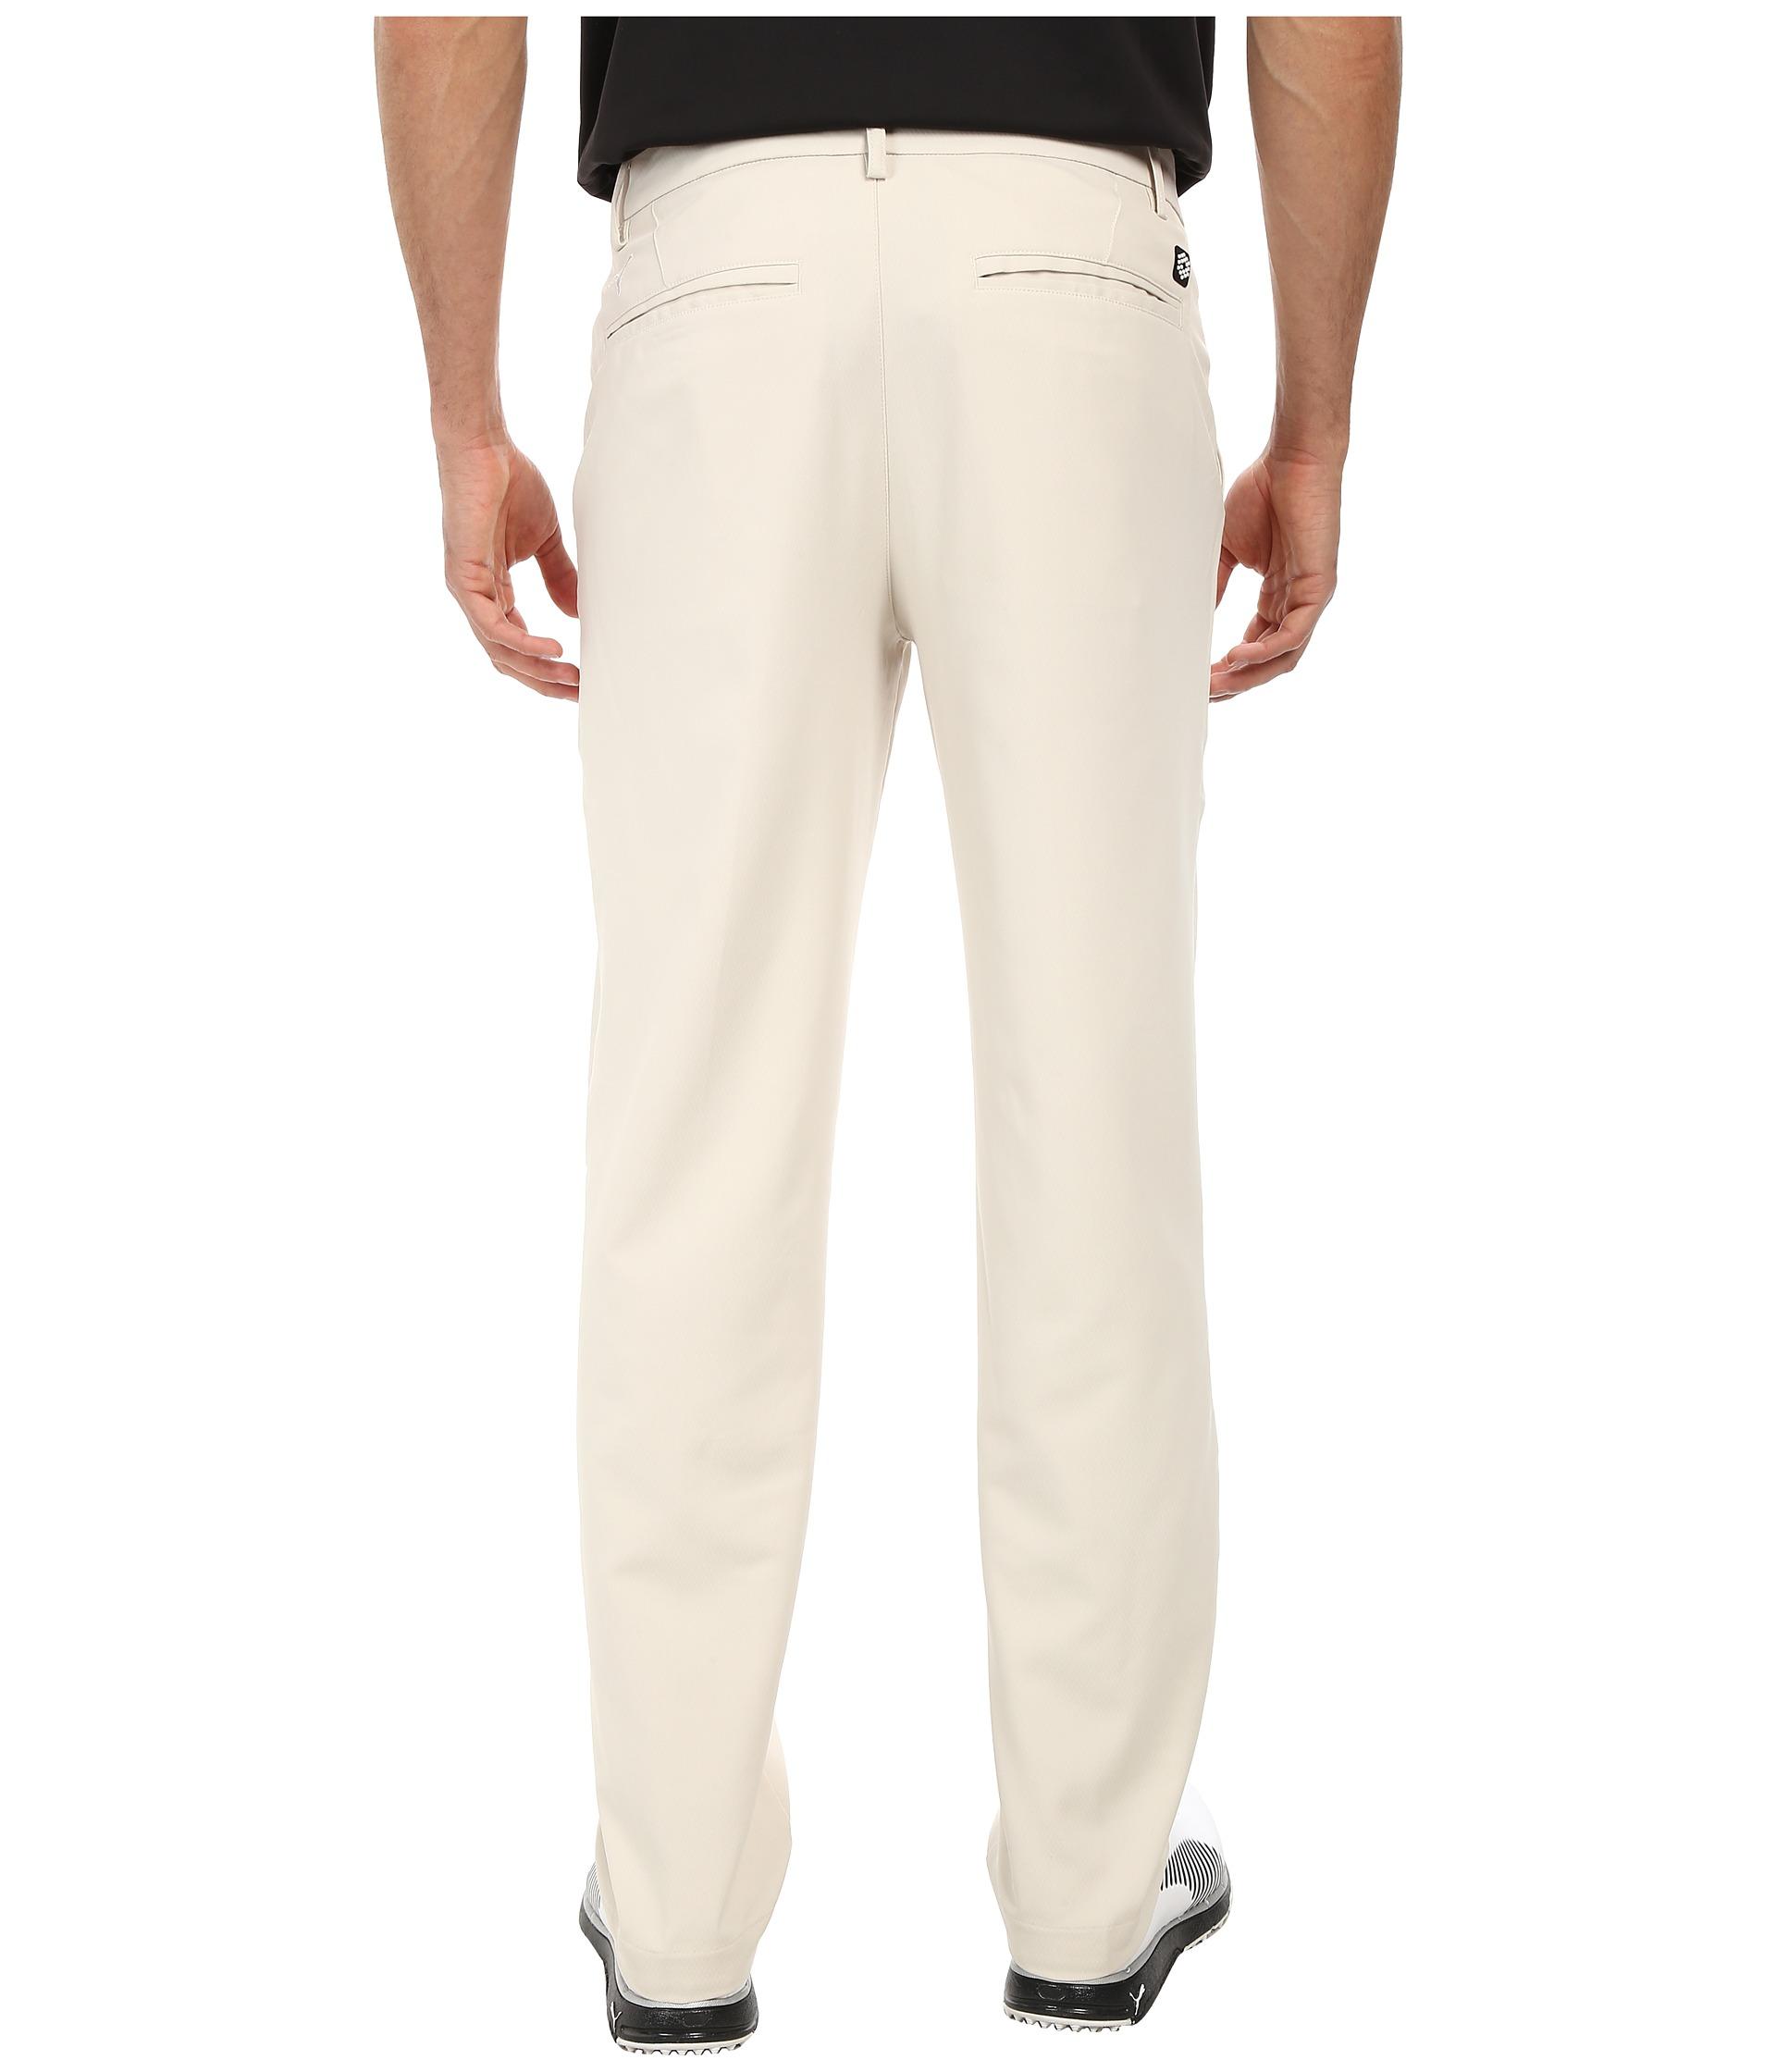 Simple Puma Womens Golf Stripe 78 Pants 557993  Discount Golf World